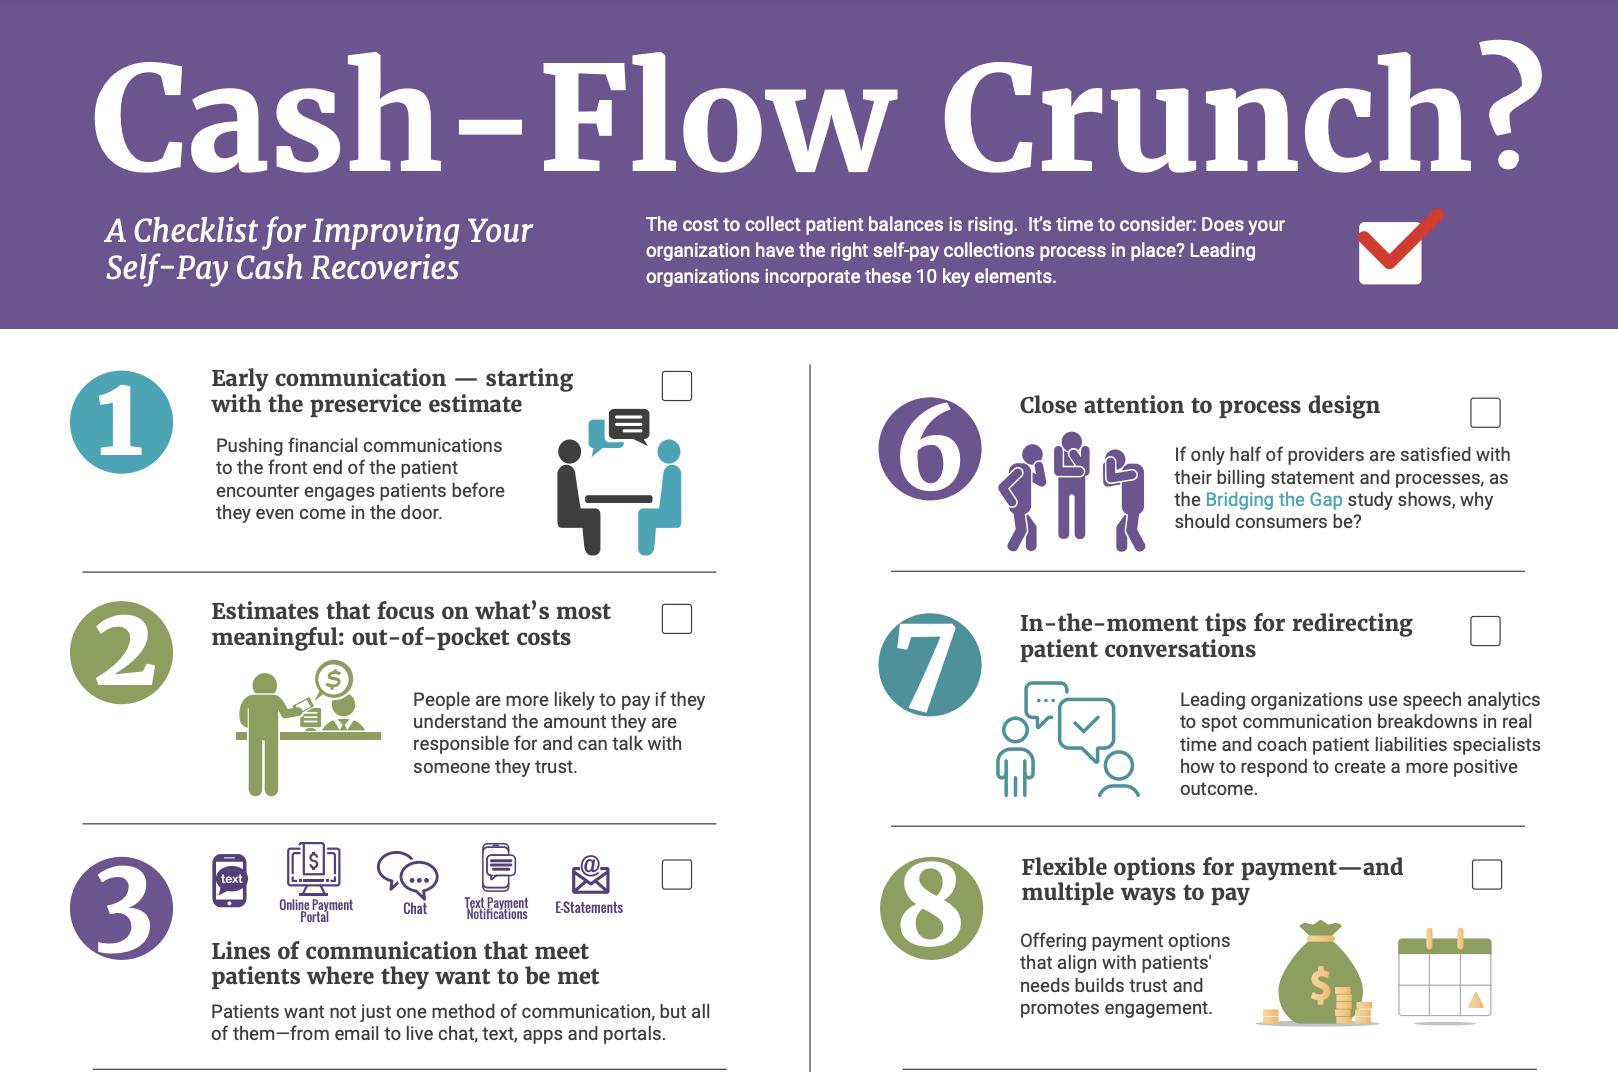 CashFlowCrunch